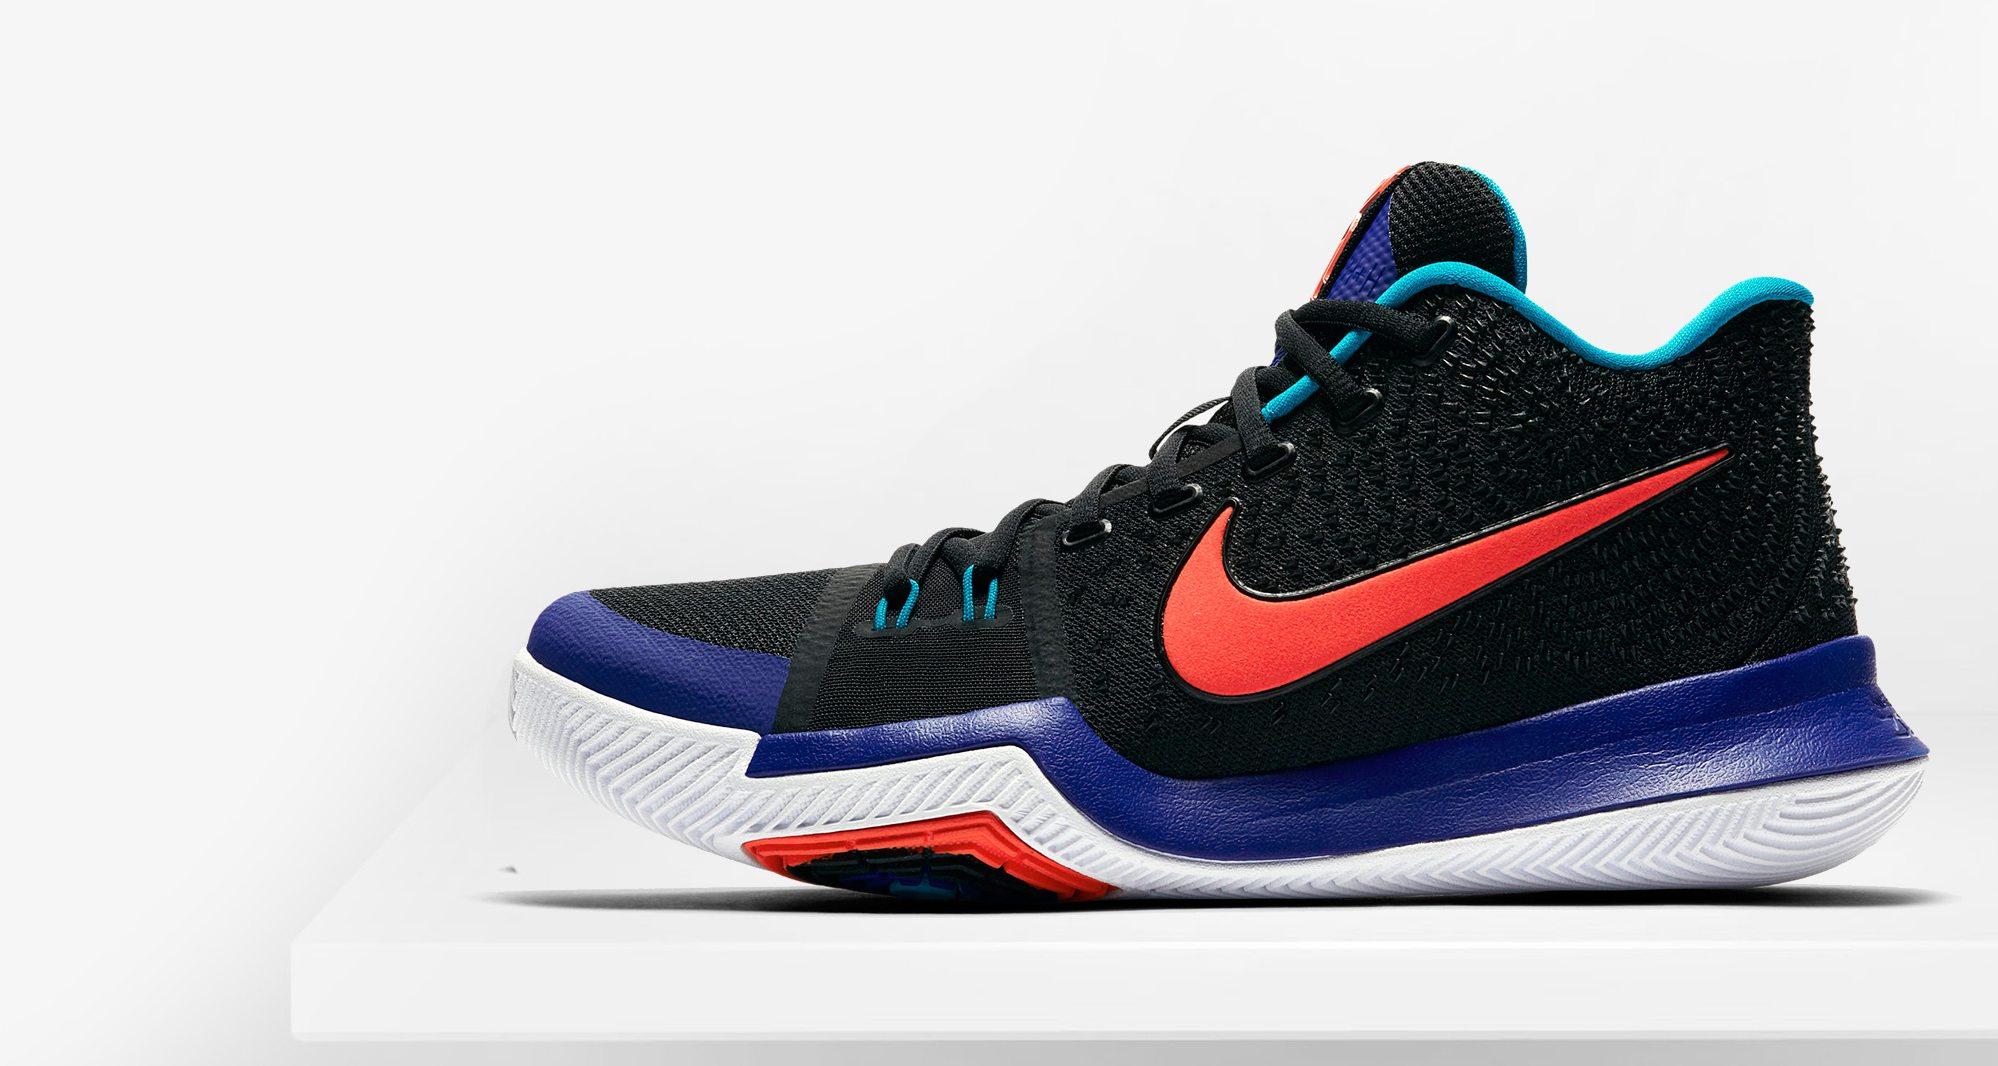 591659877f48 Nike Kyrie 3